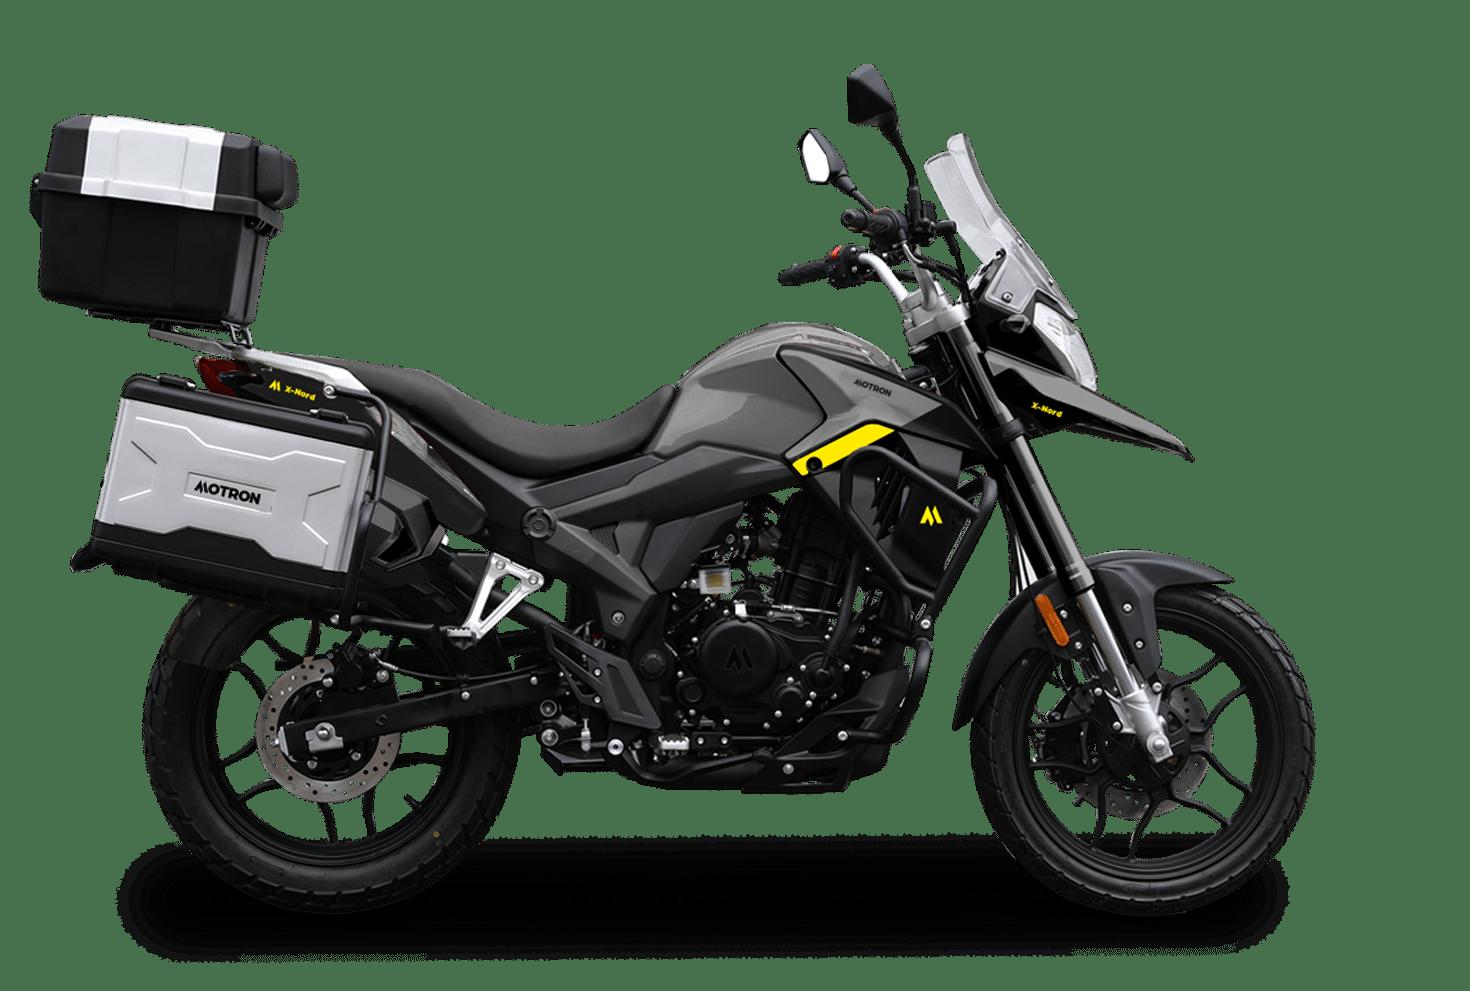 Motron Motorcycles - X-Nord 125 Touring